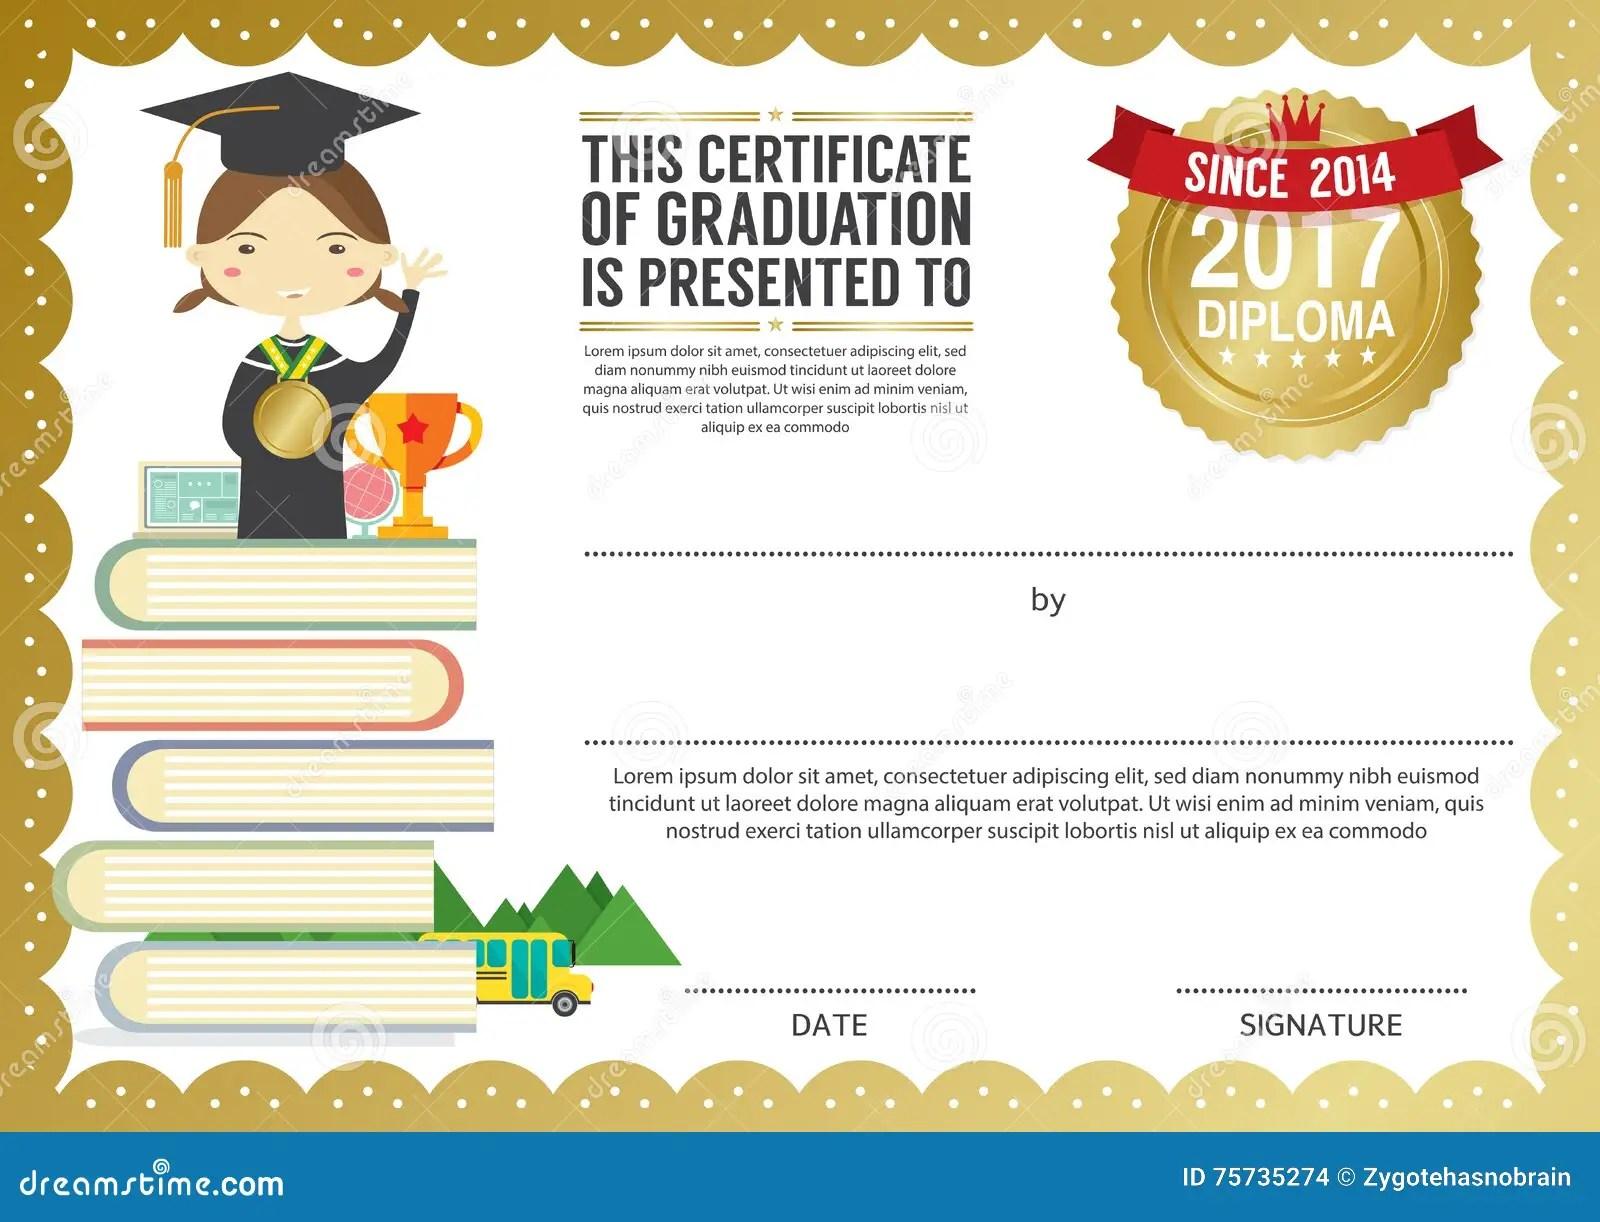 Wallpaper Border For Girl Nursery Certificates Kindergarten And Elementary Preschool Kids